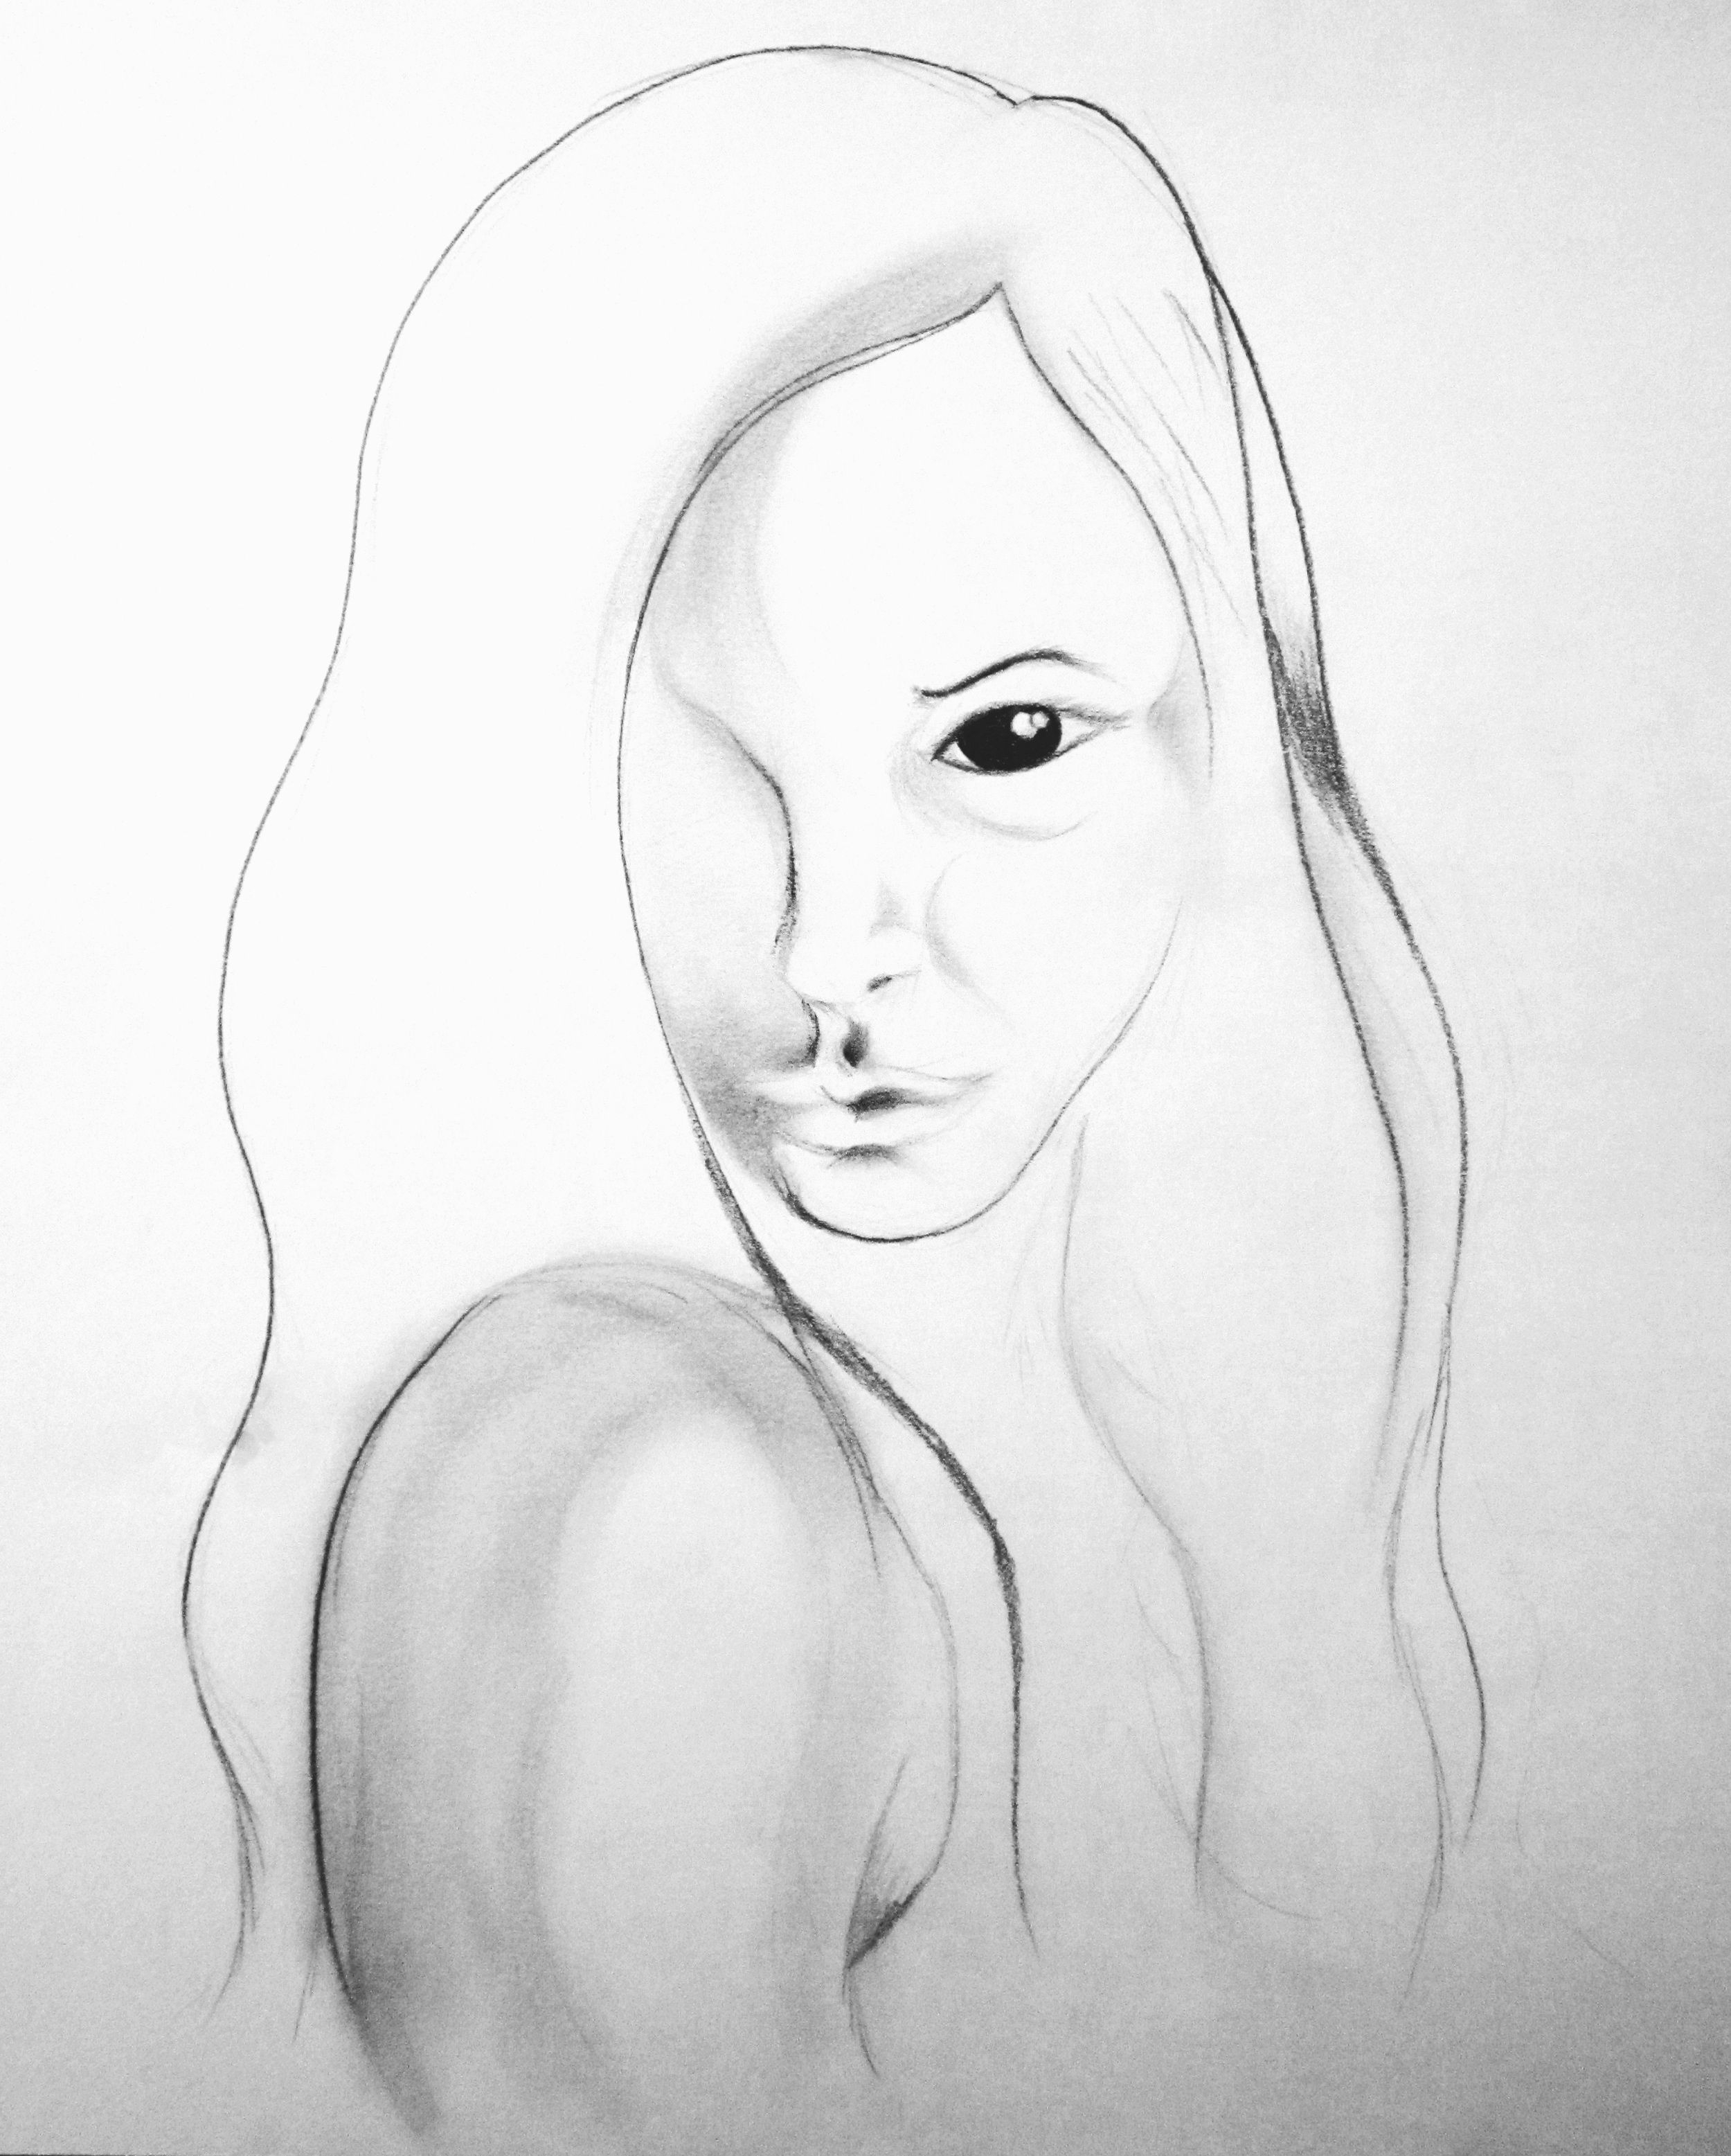 girl_sketch.jpg